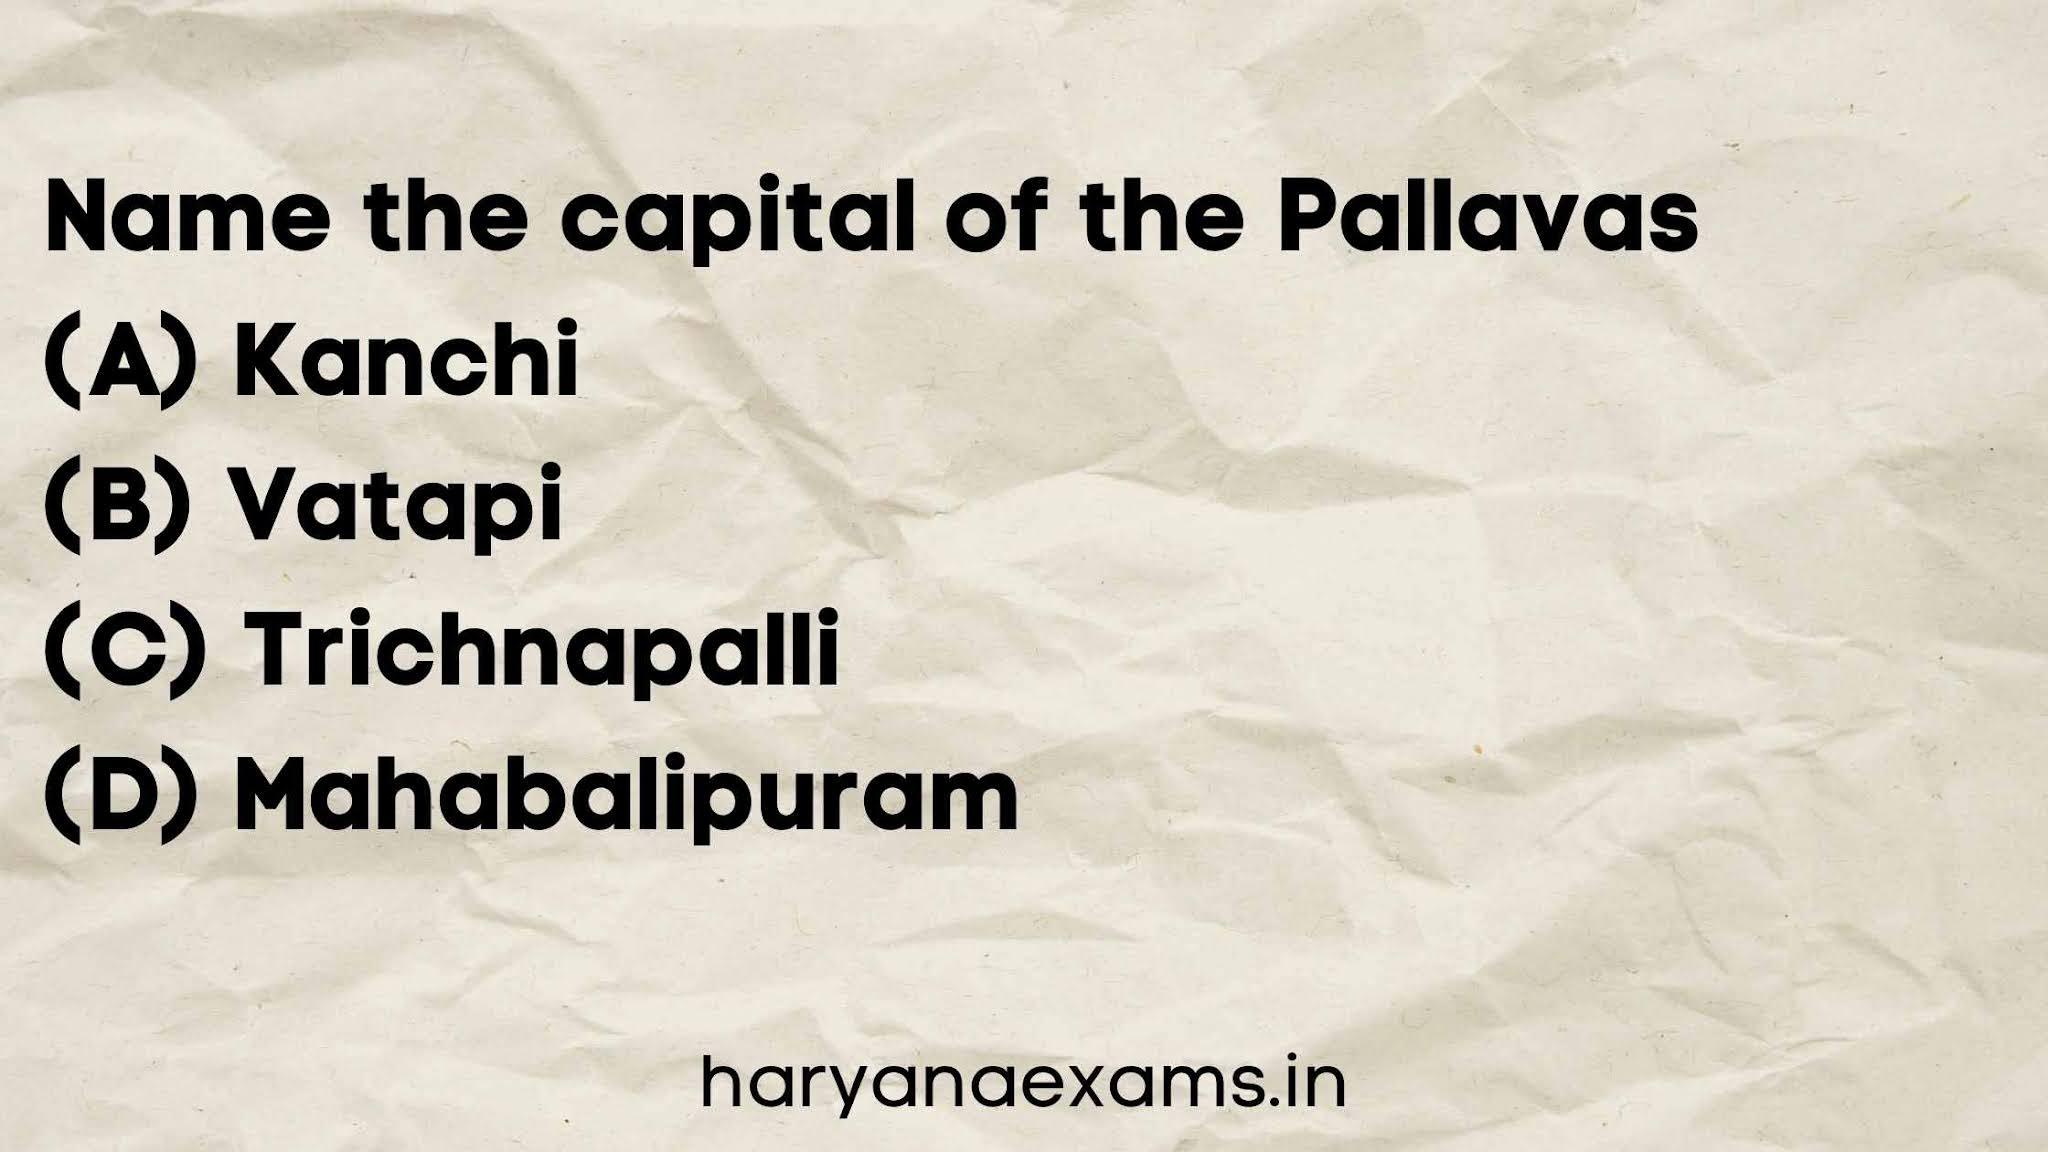 Name the capital of the Pallavas   (A) Kanchi   (B) Vatapi   (C) Trichnapalli   (D) Mahabalipuram